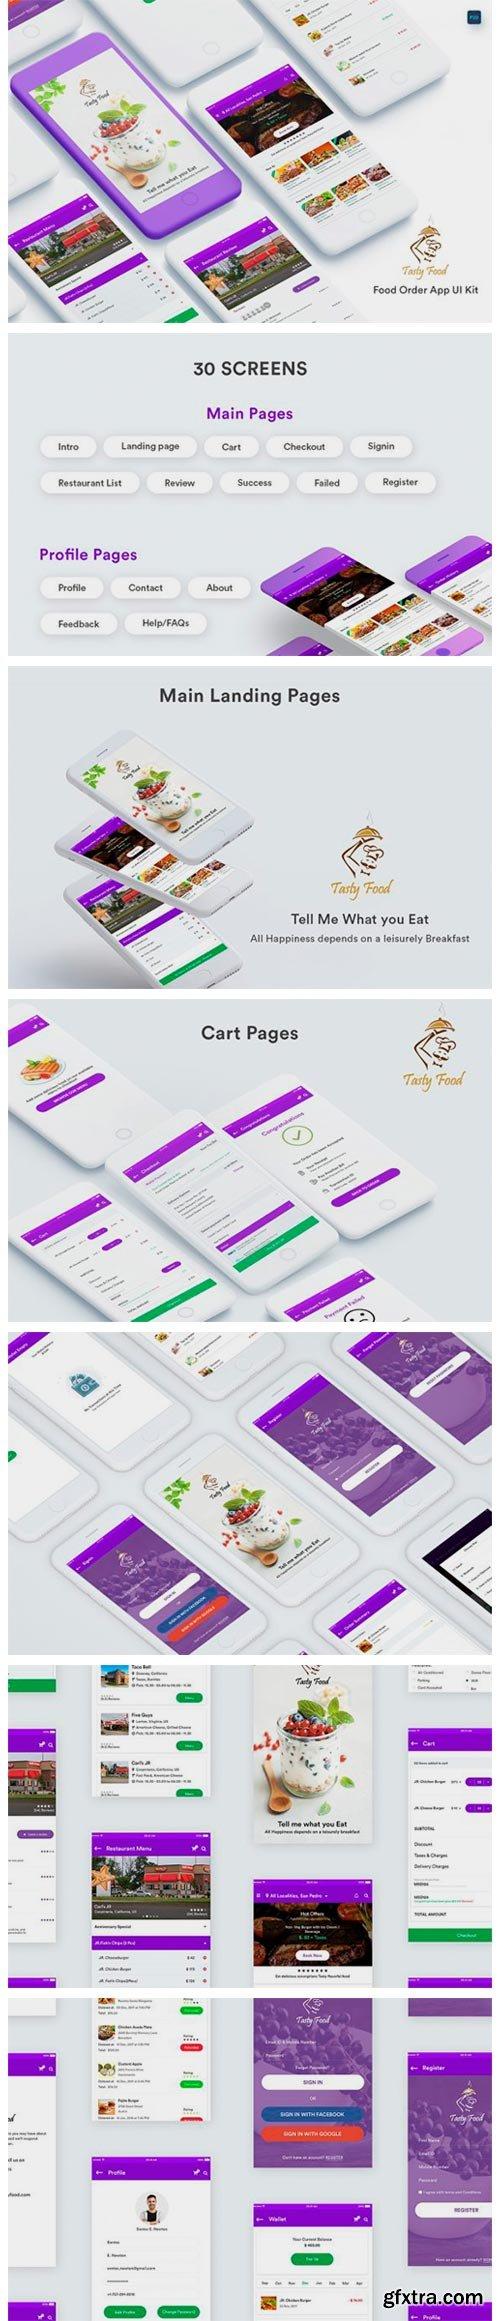 Online Food Order Mobile App UI Kit 9068977